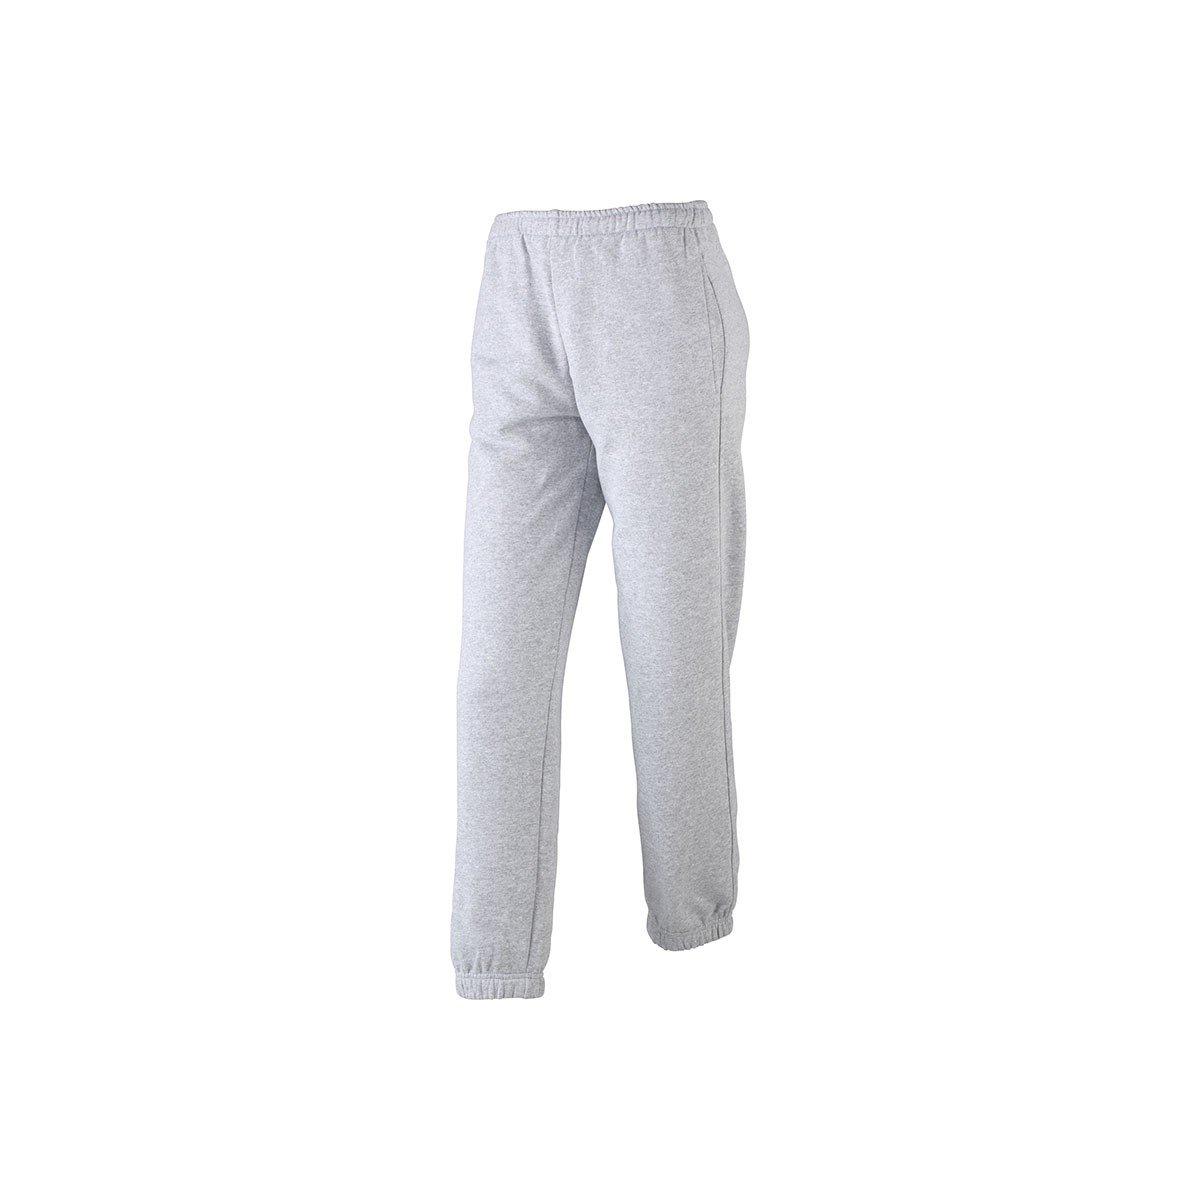 NJ Pantalon Jogging Junior